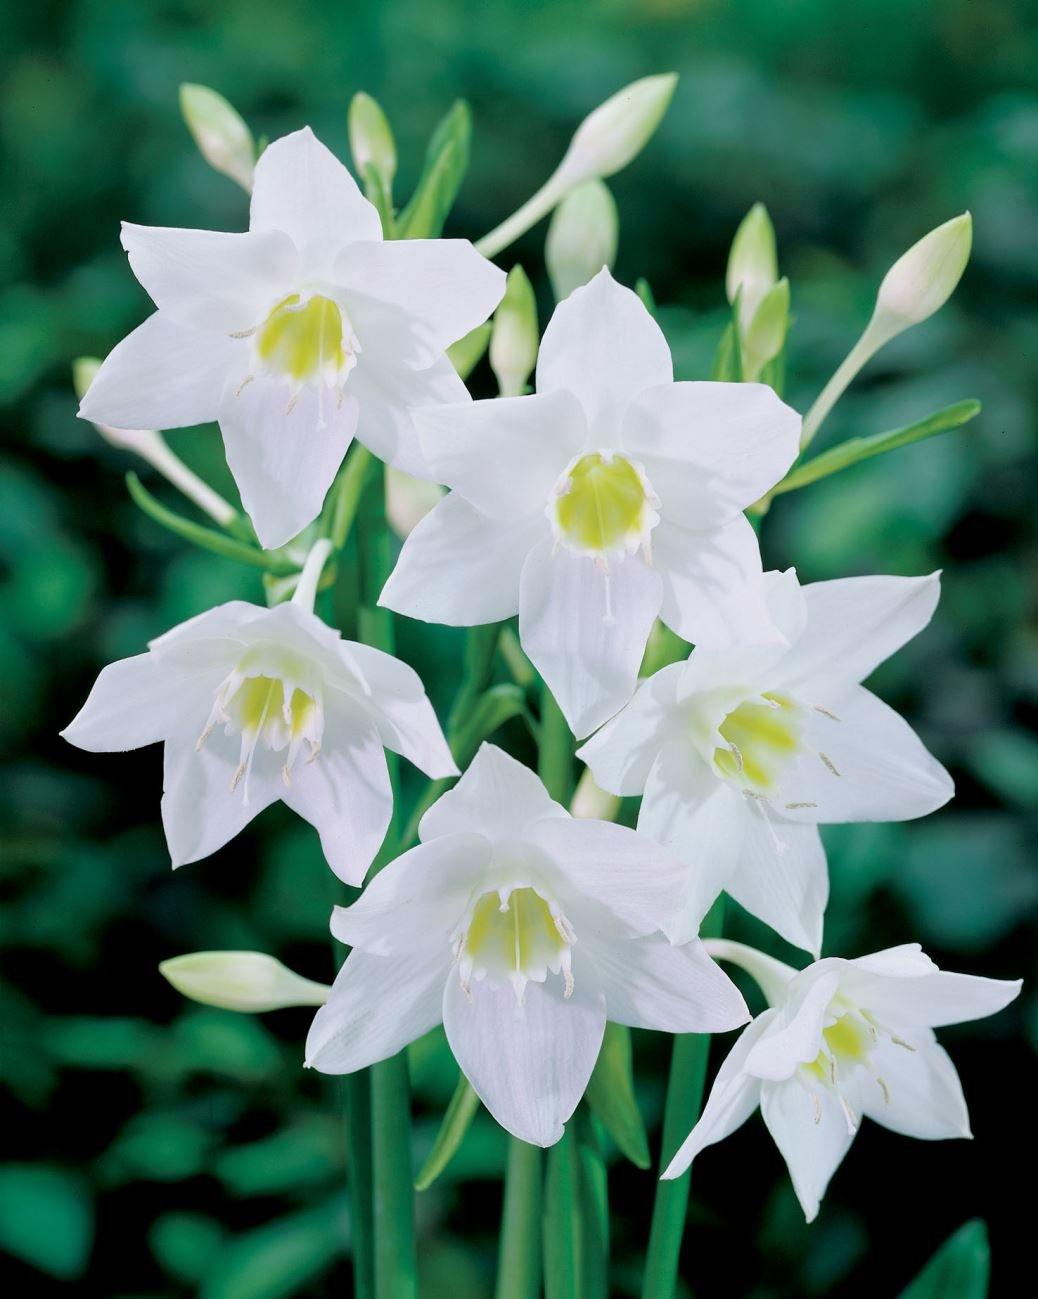 Lily Lily//Eucharis ica Eucharis ica bulbo//tub/érculo // ra/íz